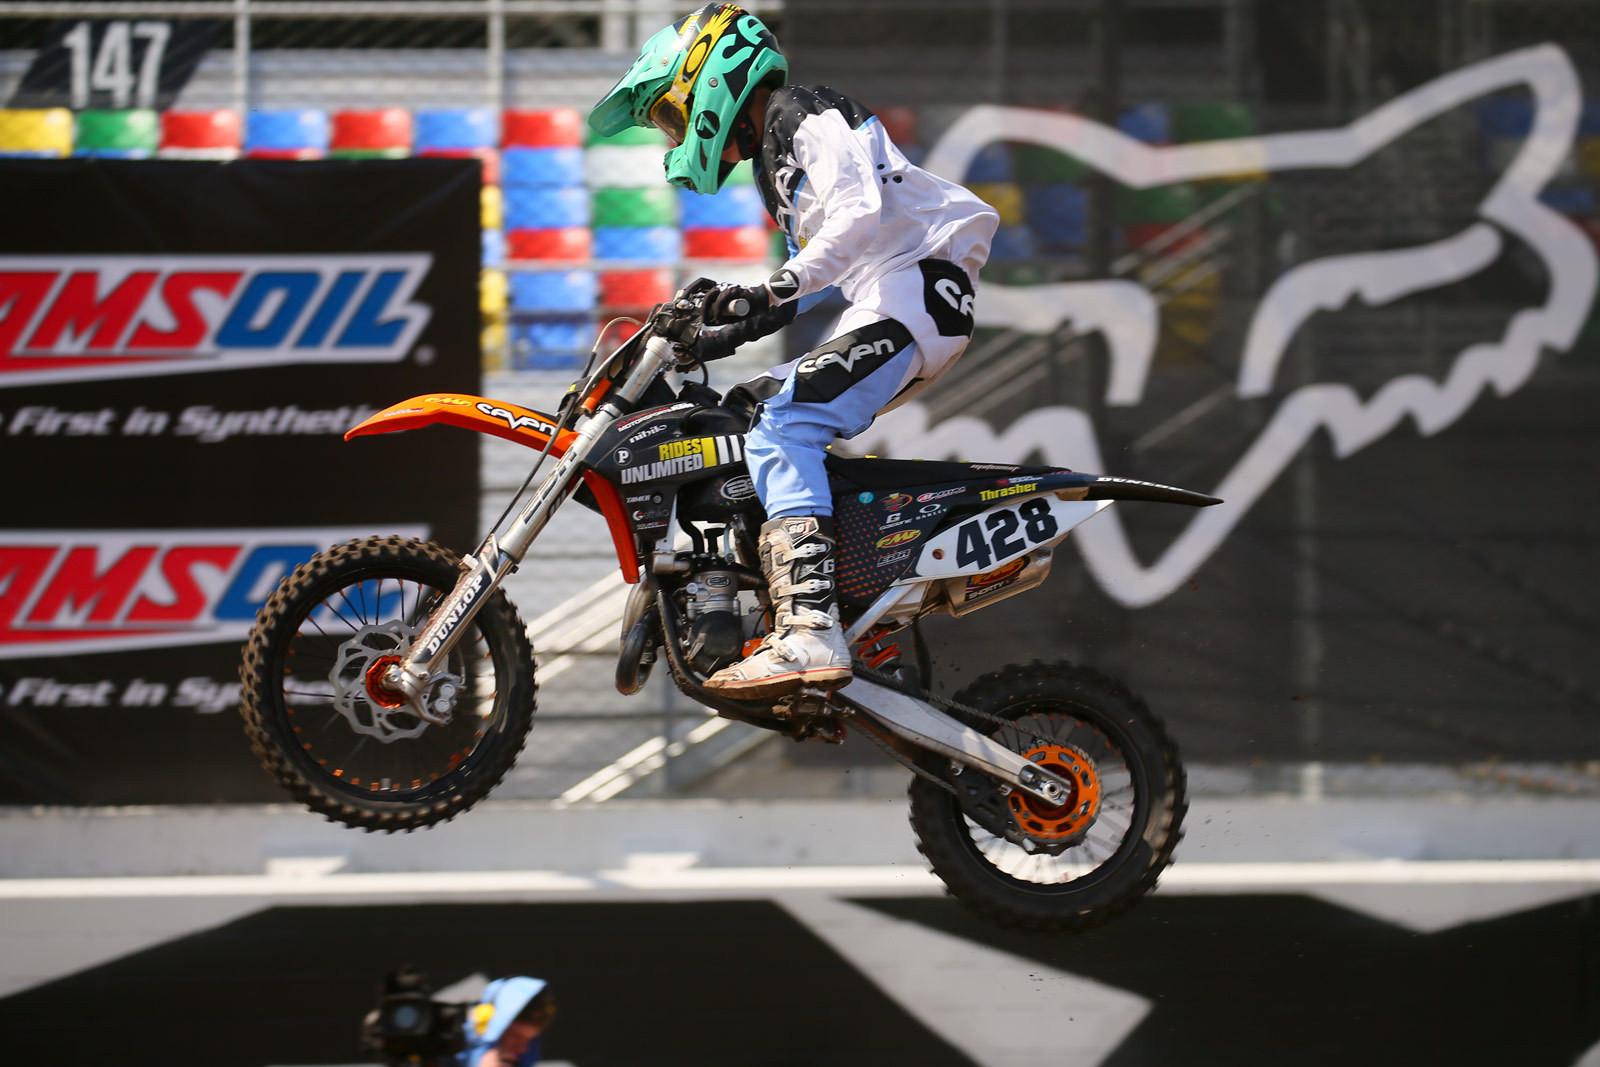 Nathaniel Thrasher - 2016 Ricky Carmichael Amateur Supercross - Motocross Pictures - Vital MX